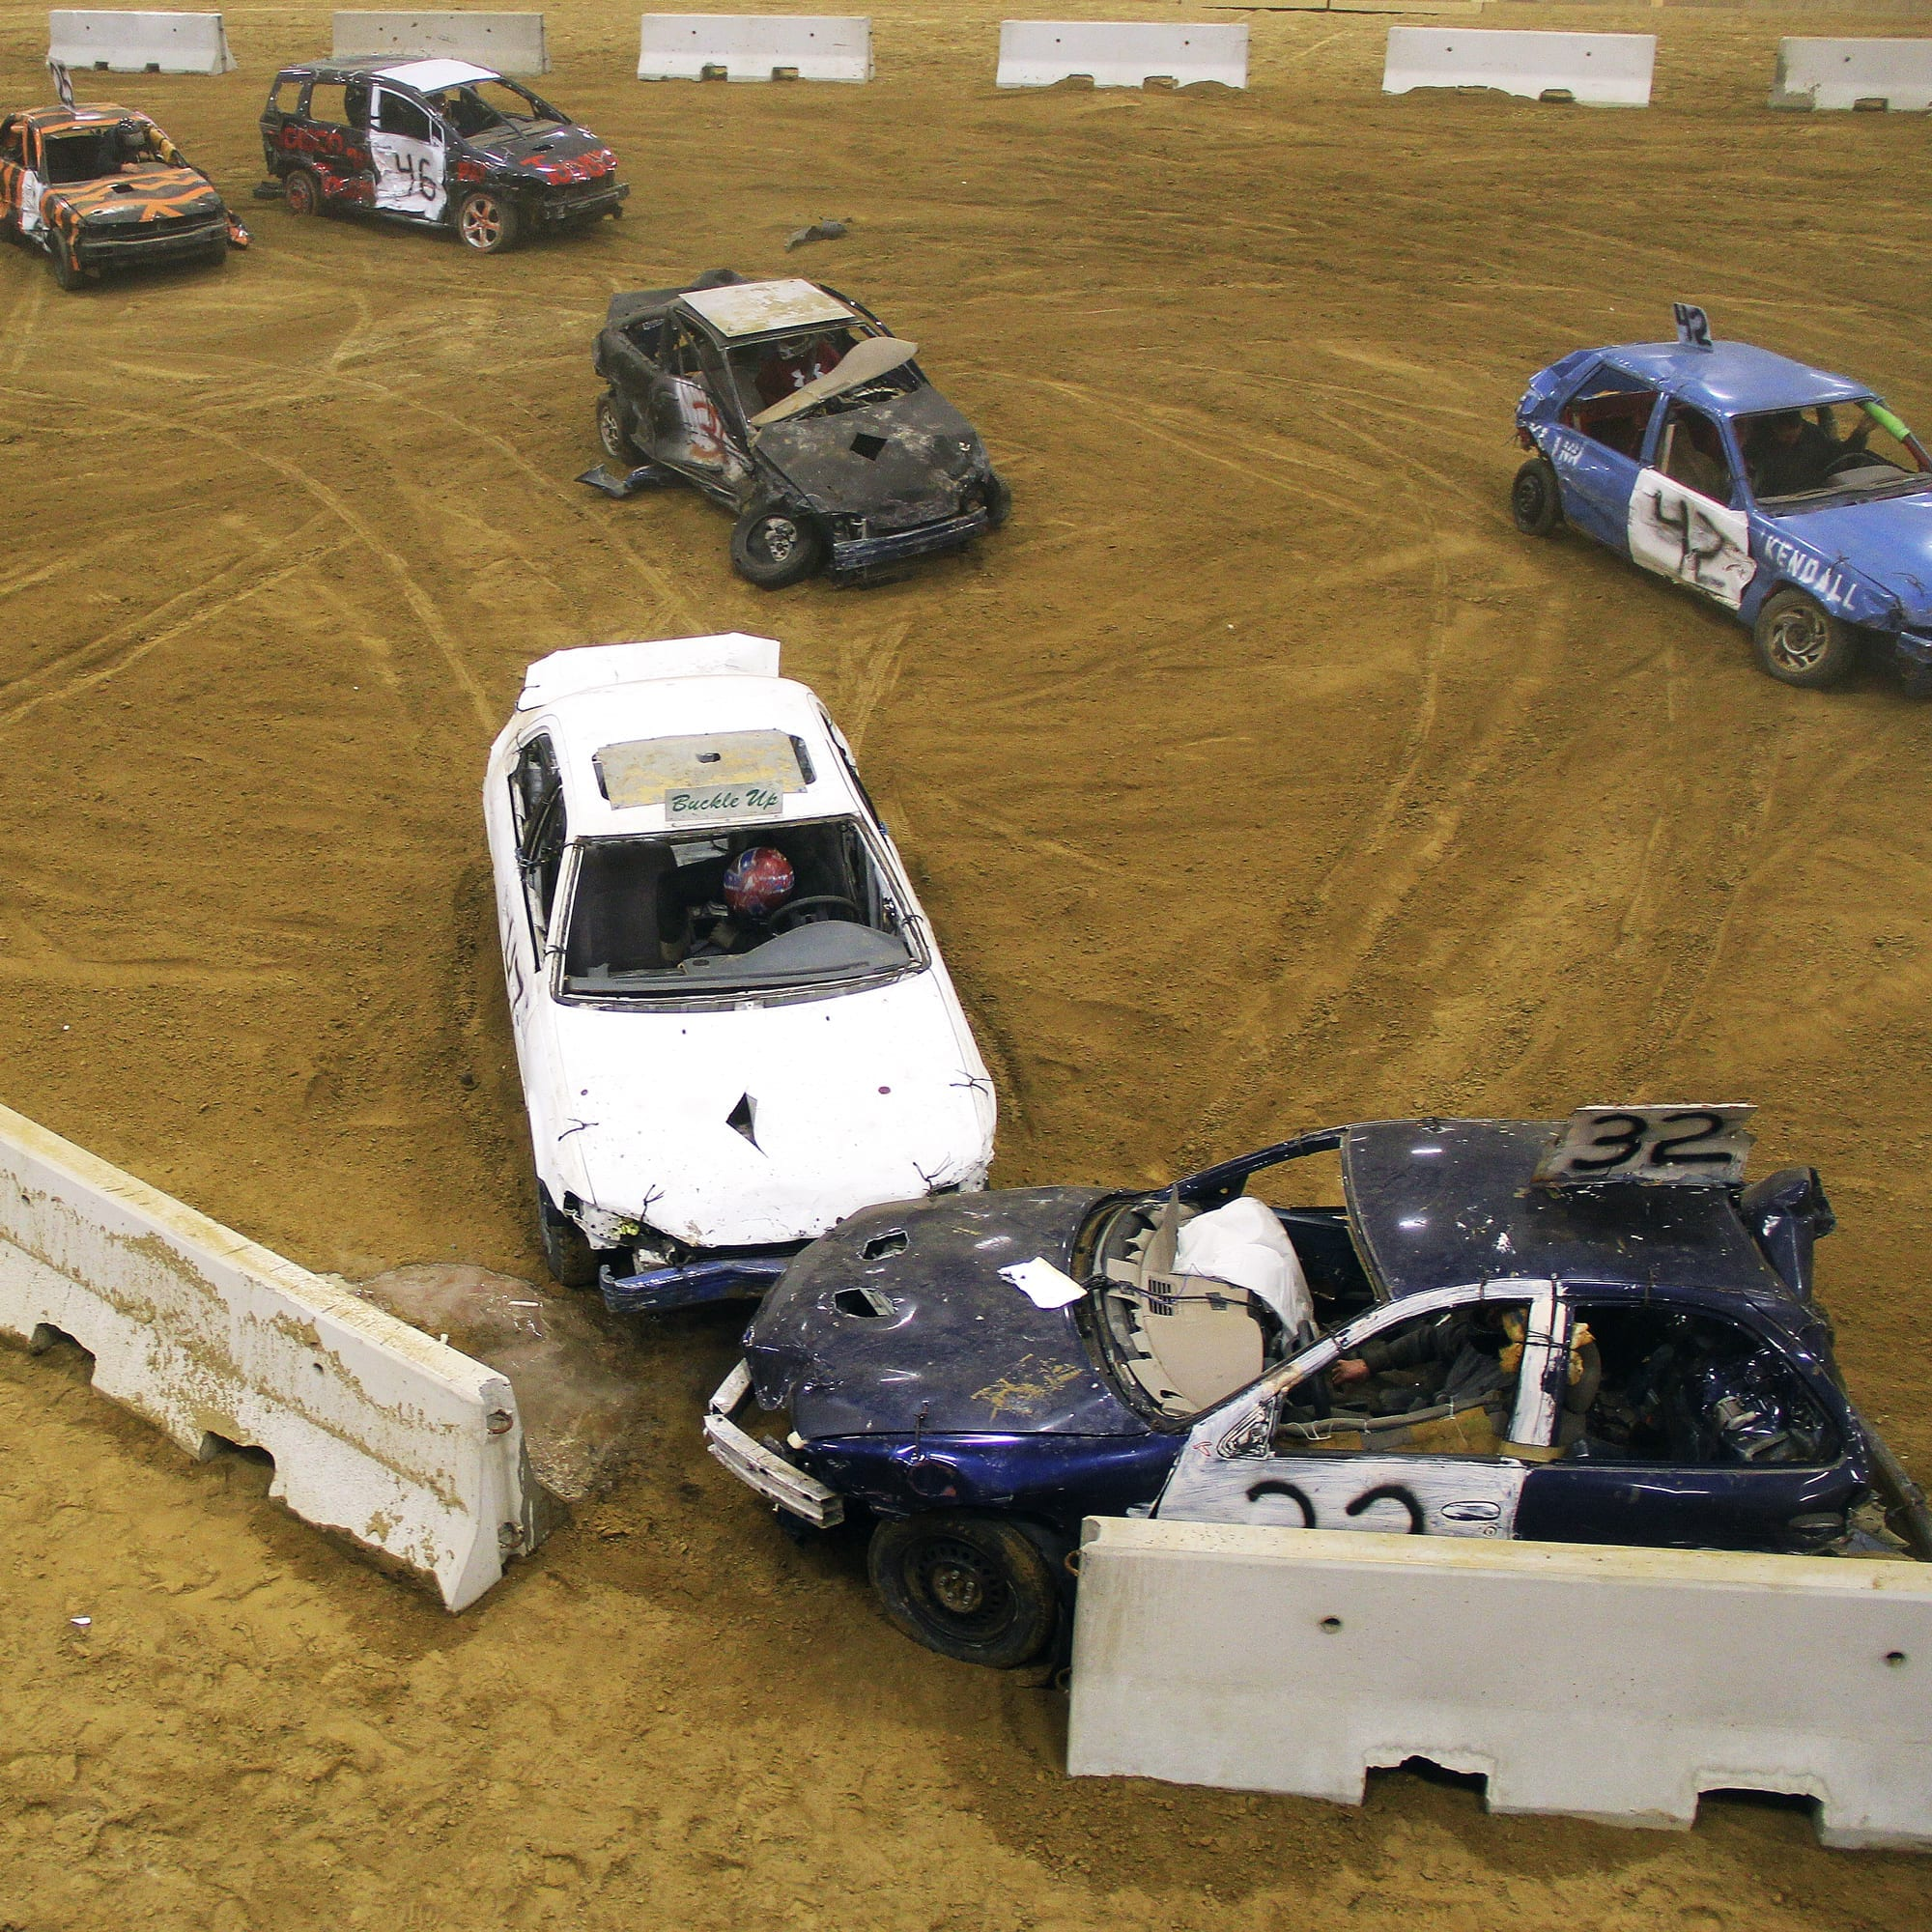 Demolition Derby at the topsfield fair